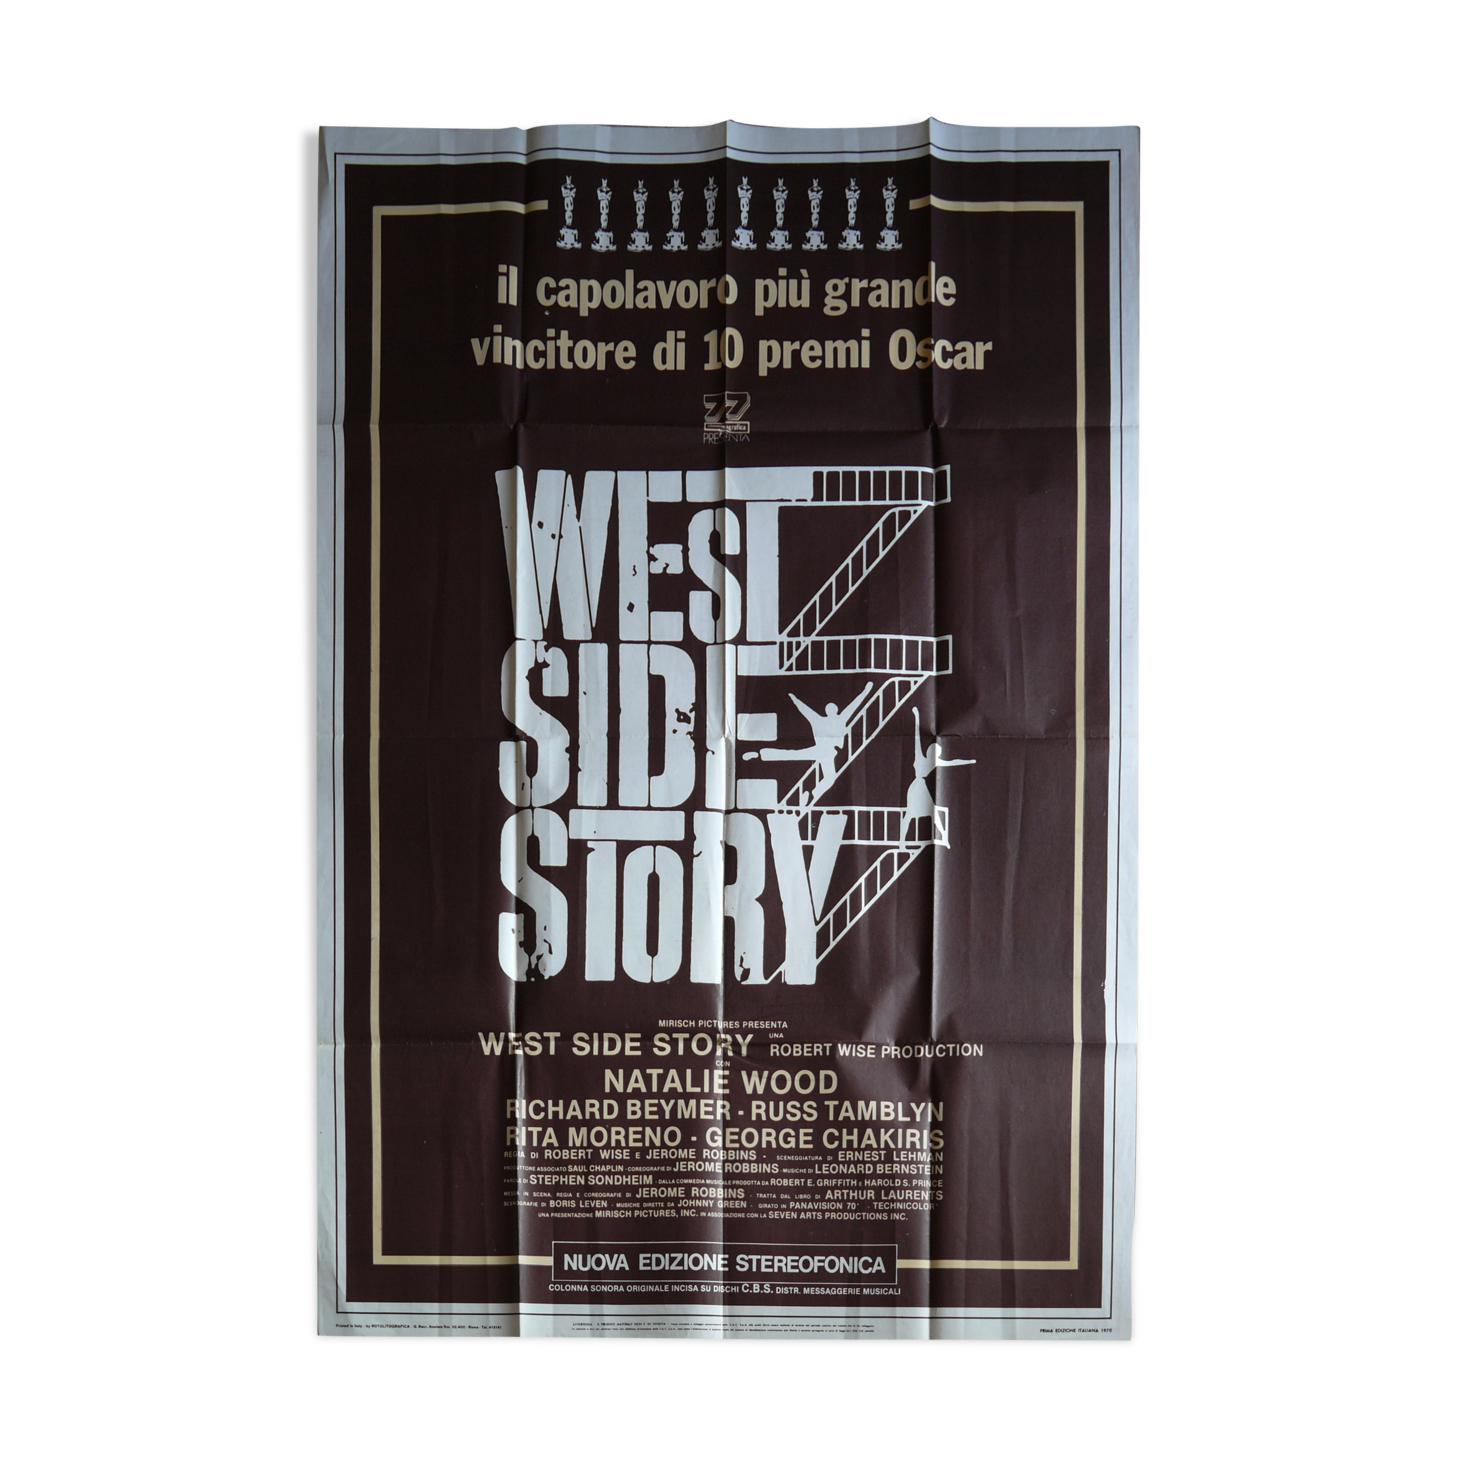 Affiche de cinéma originale - West Side Story - Robert Wise, Natalie Wood